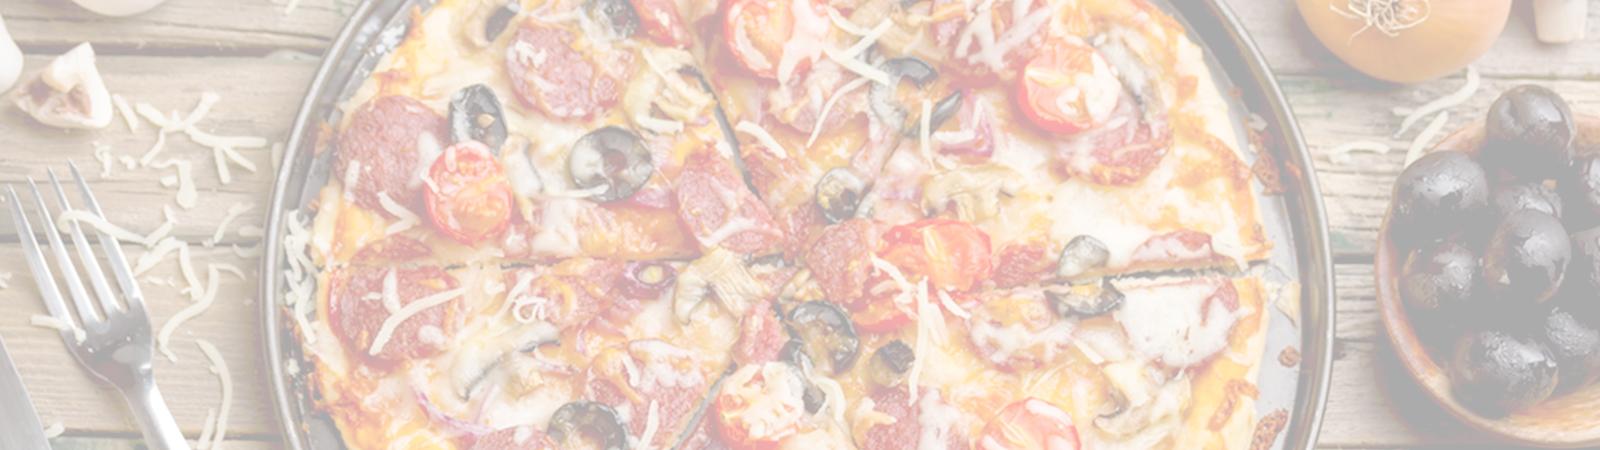 Pizza Hot 4 U Barry Bigfoodie